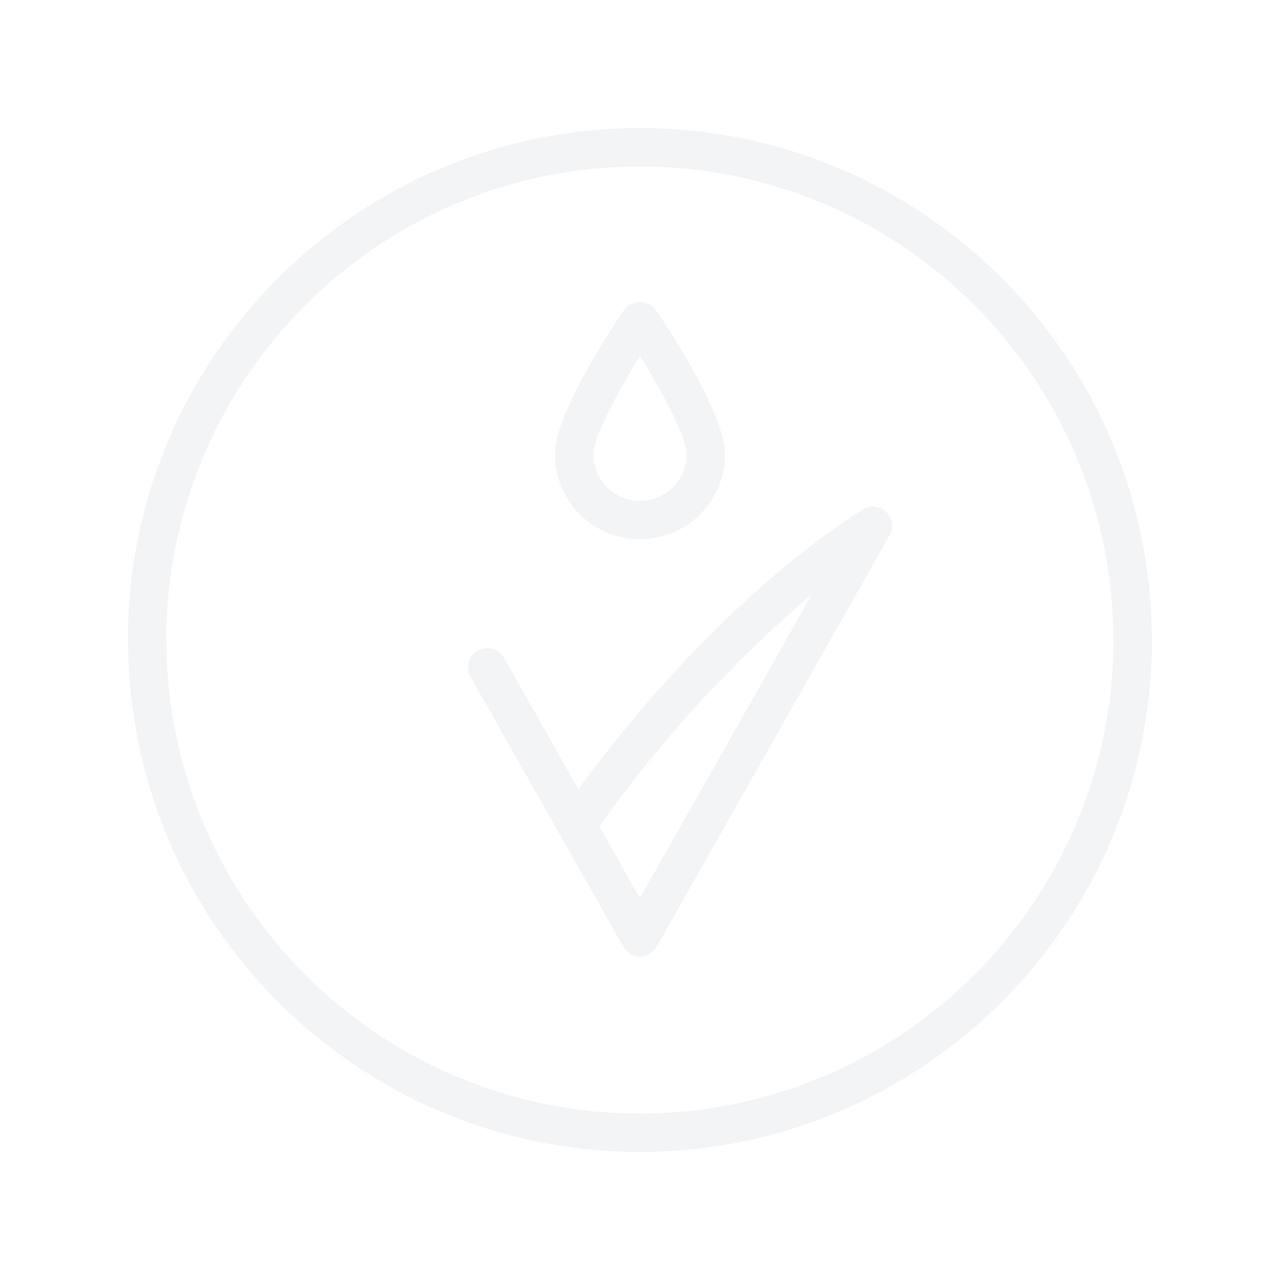 Clarins Crayon Khol Eye Pencil With Sharpener No.01 Carbon Black 1.05g